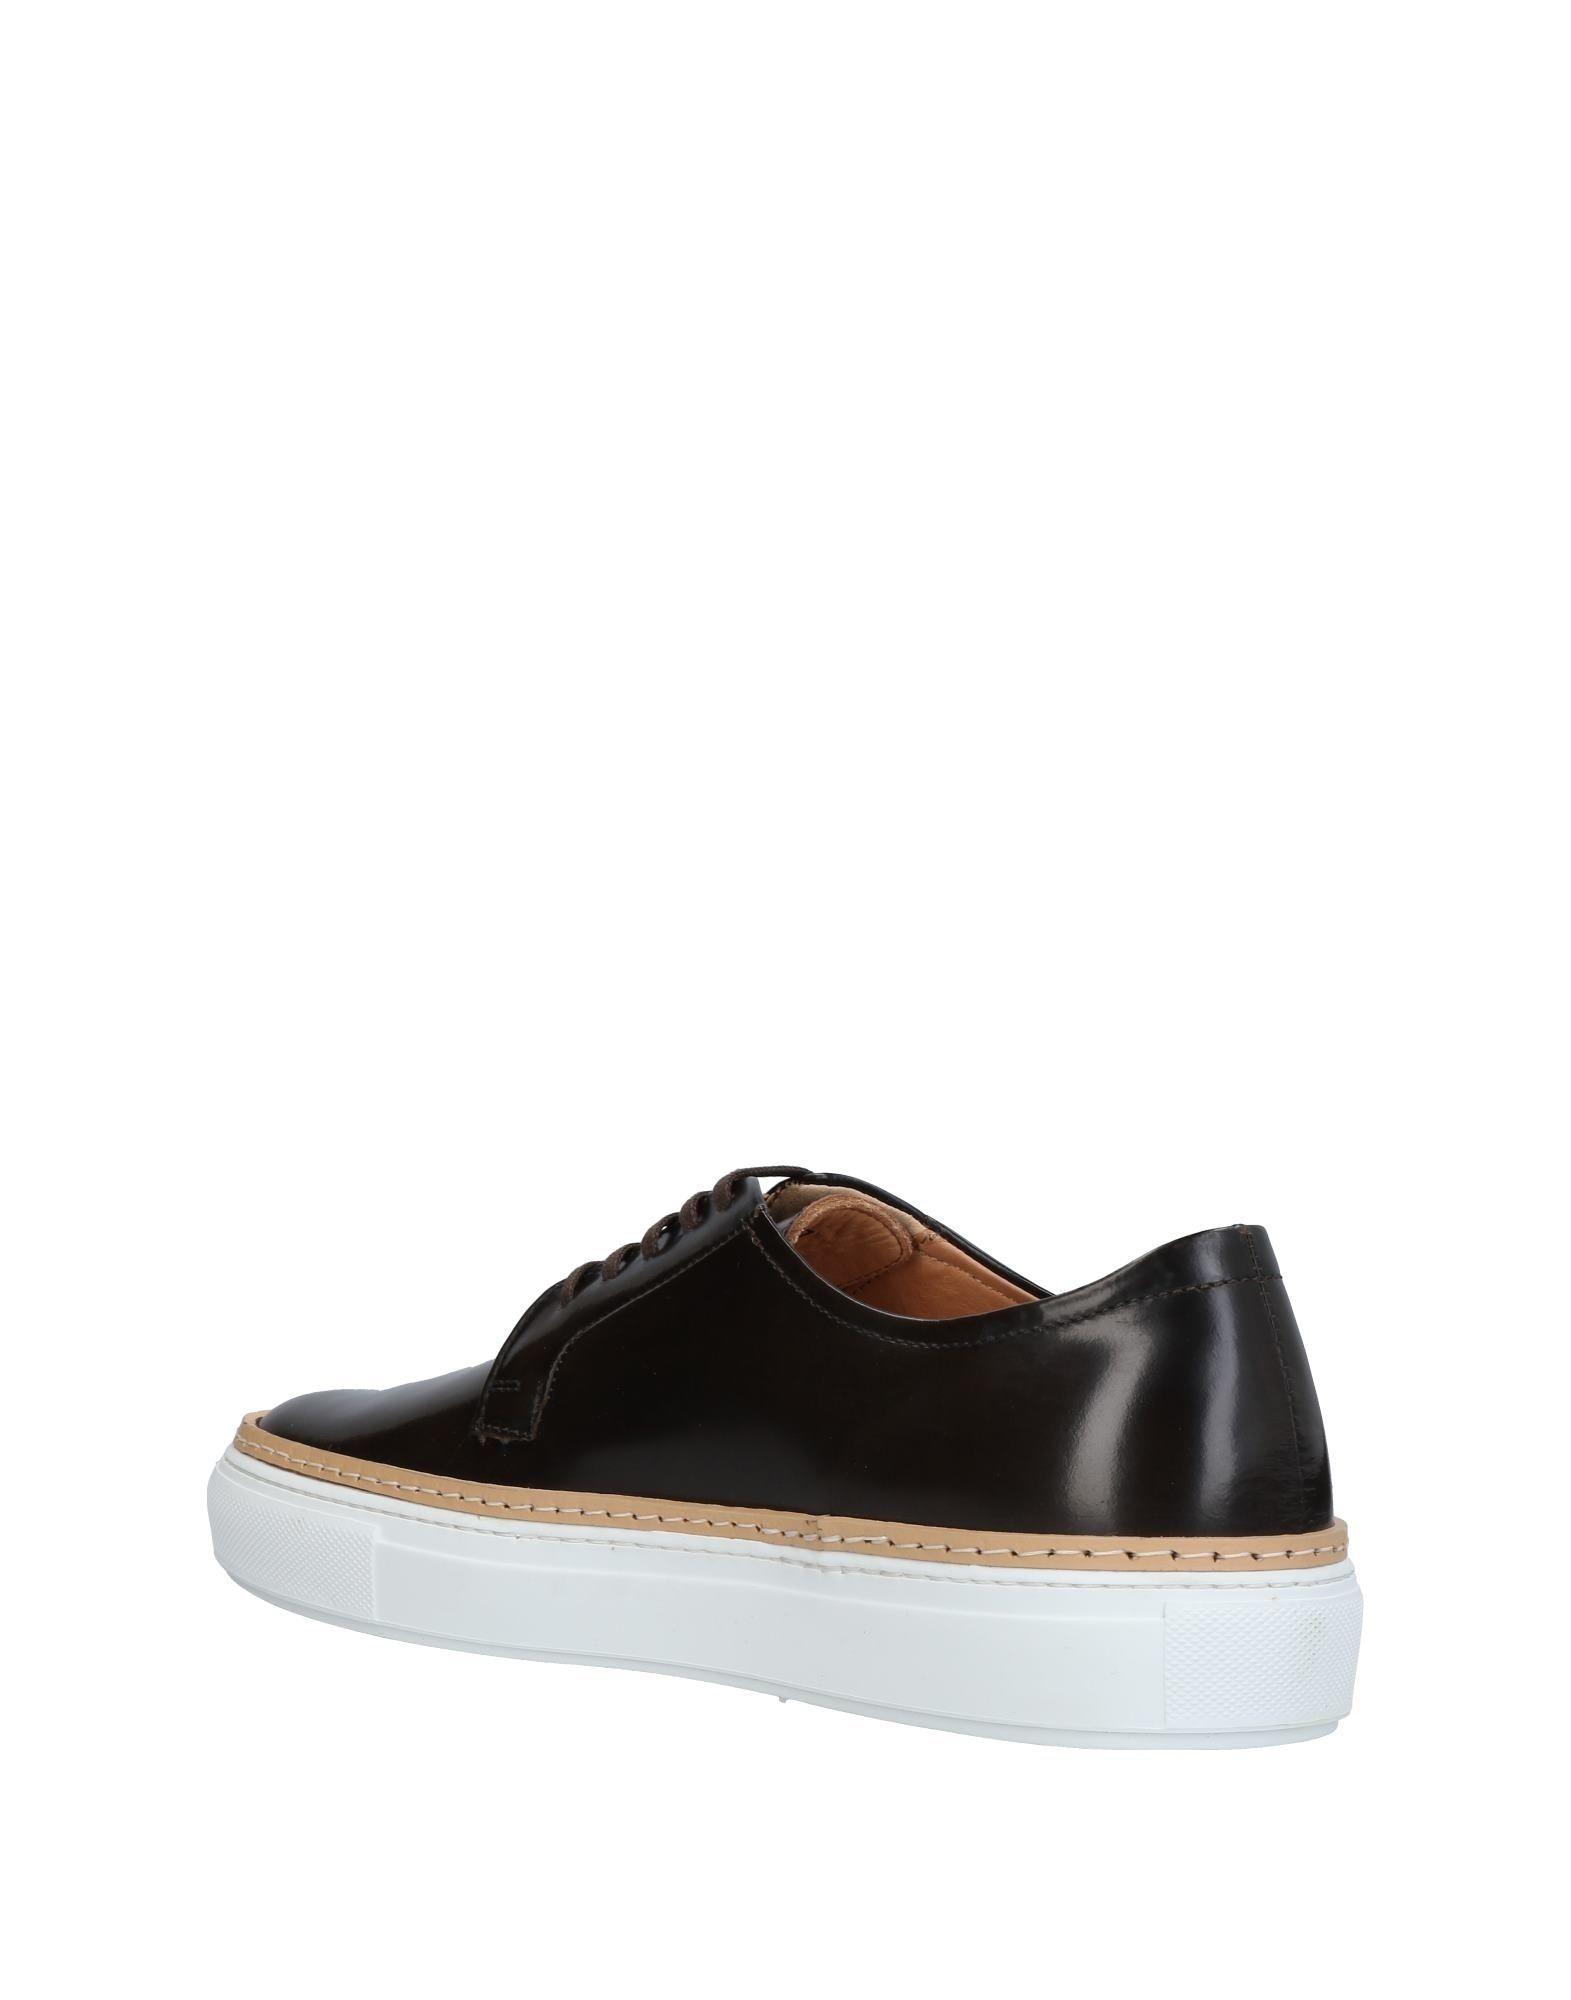 Pantofola 11456280LG D'oro Sneakers Herren  11456280LG Pantofola Gute Qualität beliebte Schuhe c1a398